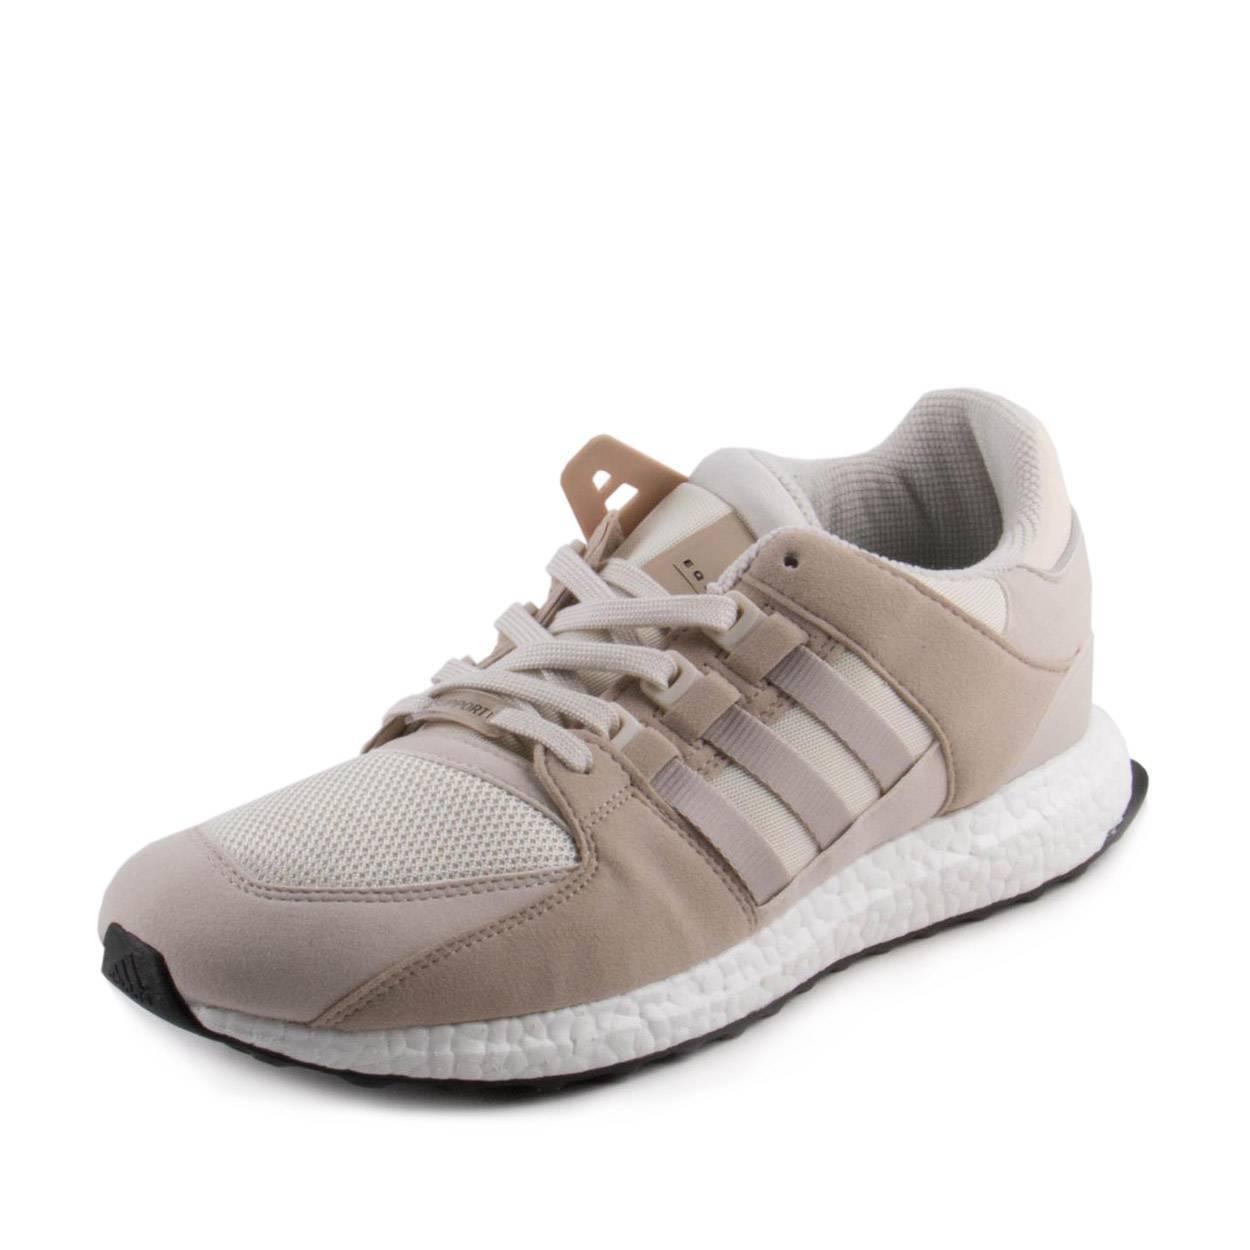 Adidas Mens EQT Support Ultra  Tan White BB1239